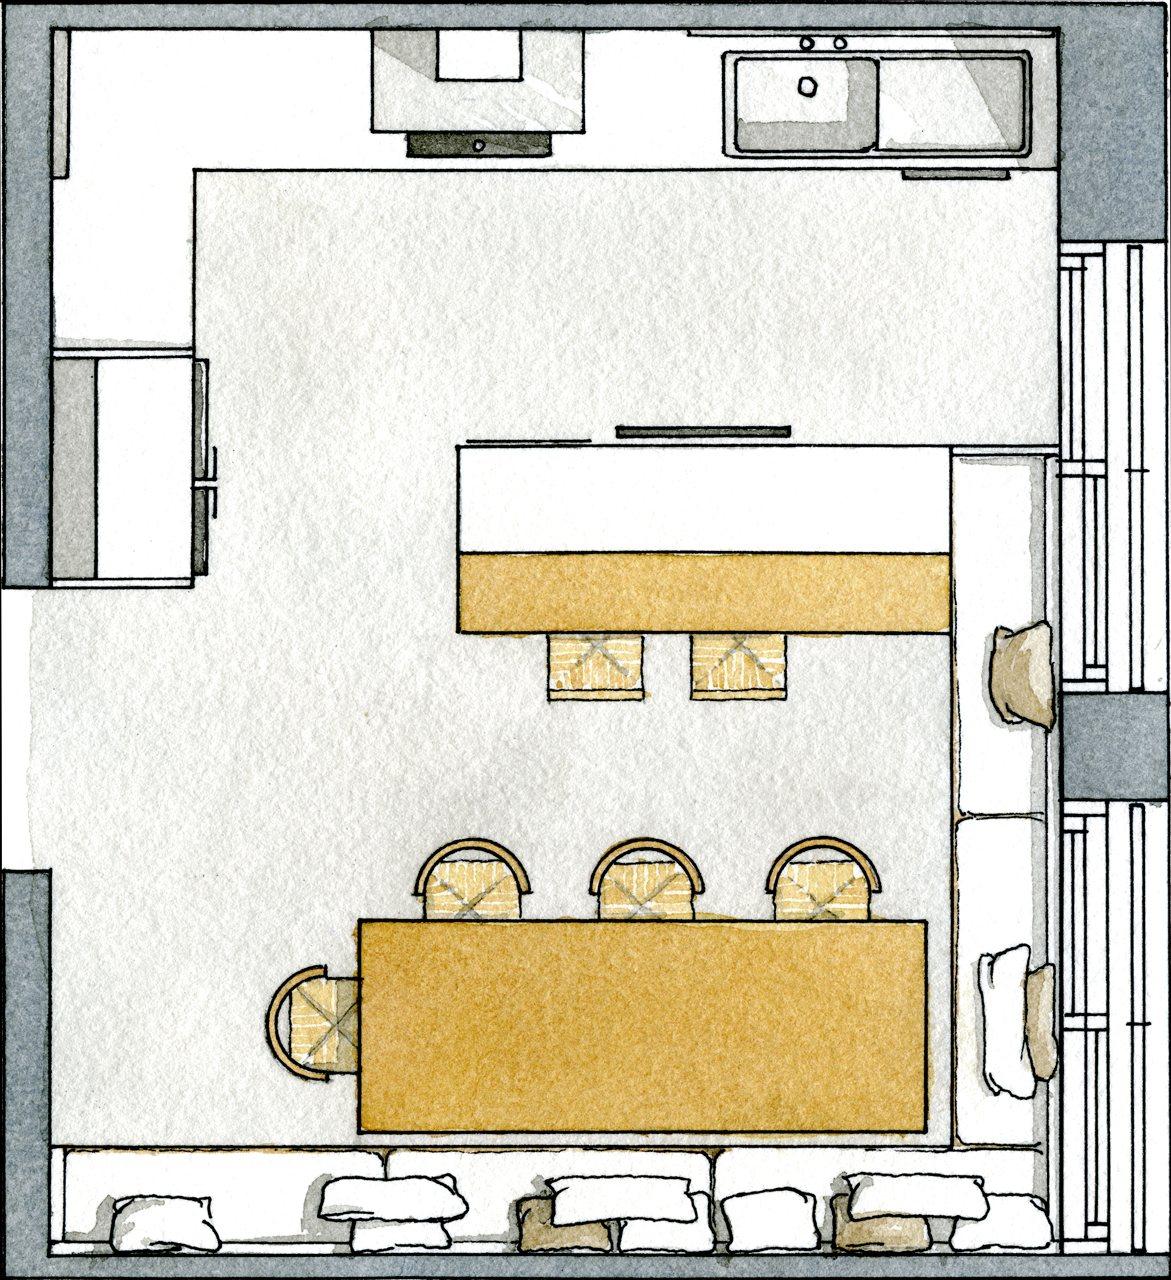 Una cocina c lida donde reunir a la familia for Plano de cocina de 3x5